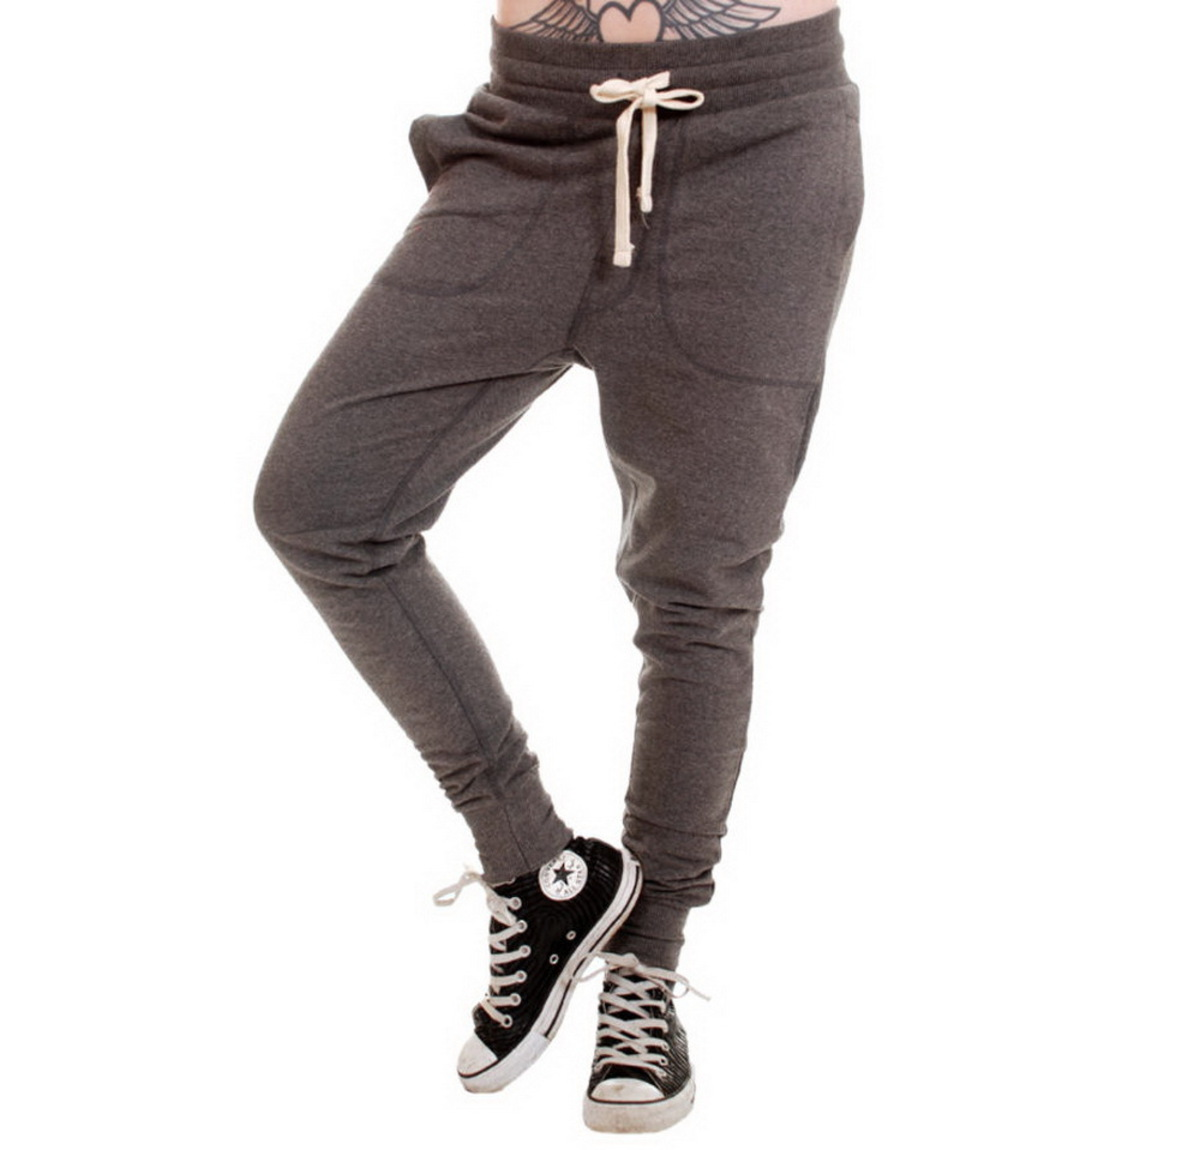 kalhoty unisex (tepláky) 3RDAND56th - Carrot Fit Jogger - Anthrax - JM1008